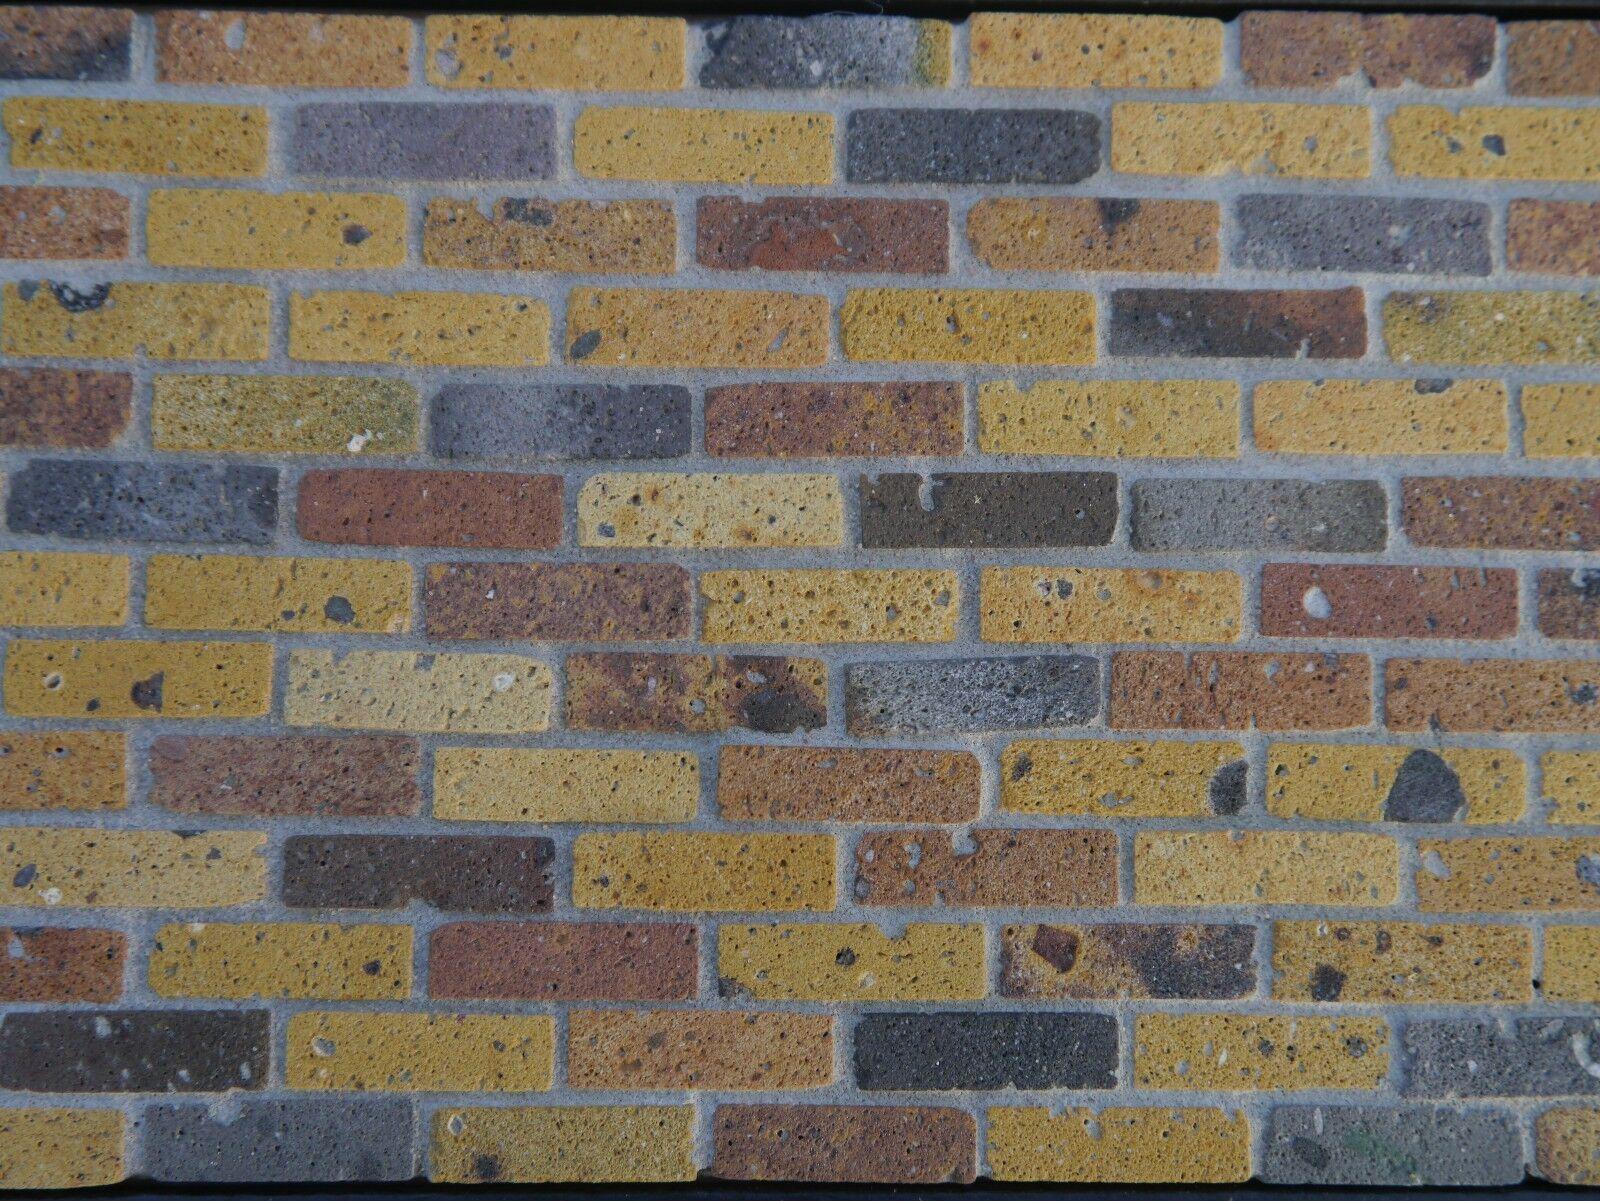 1000 1 12thGelb Stock Miniature REAL BRICK Brickslips